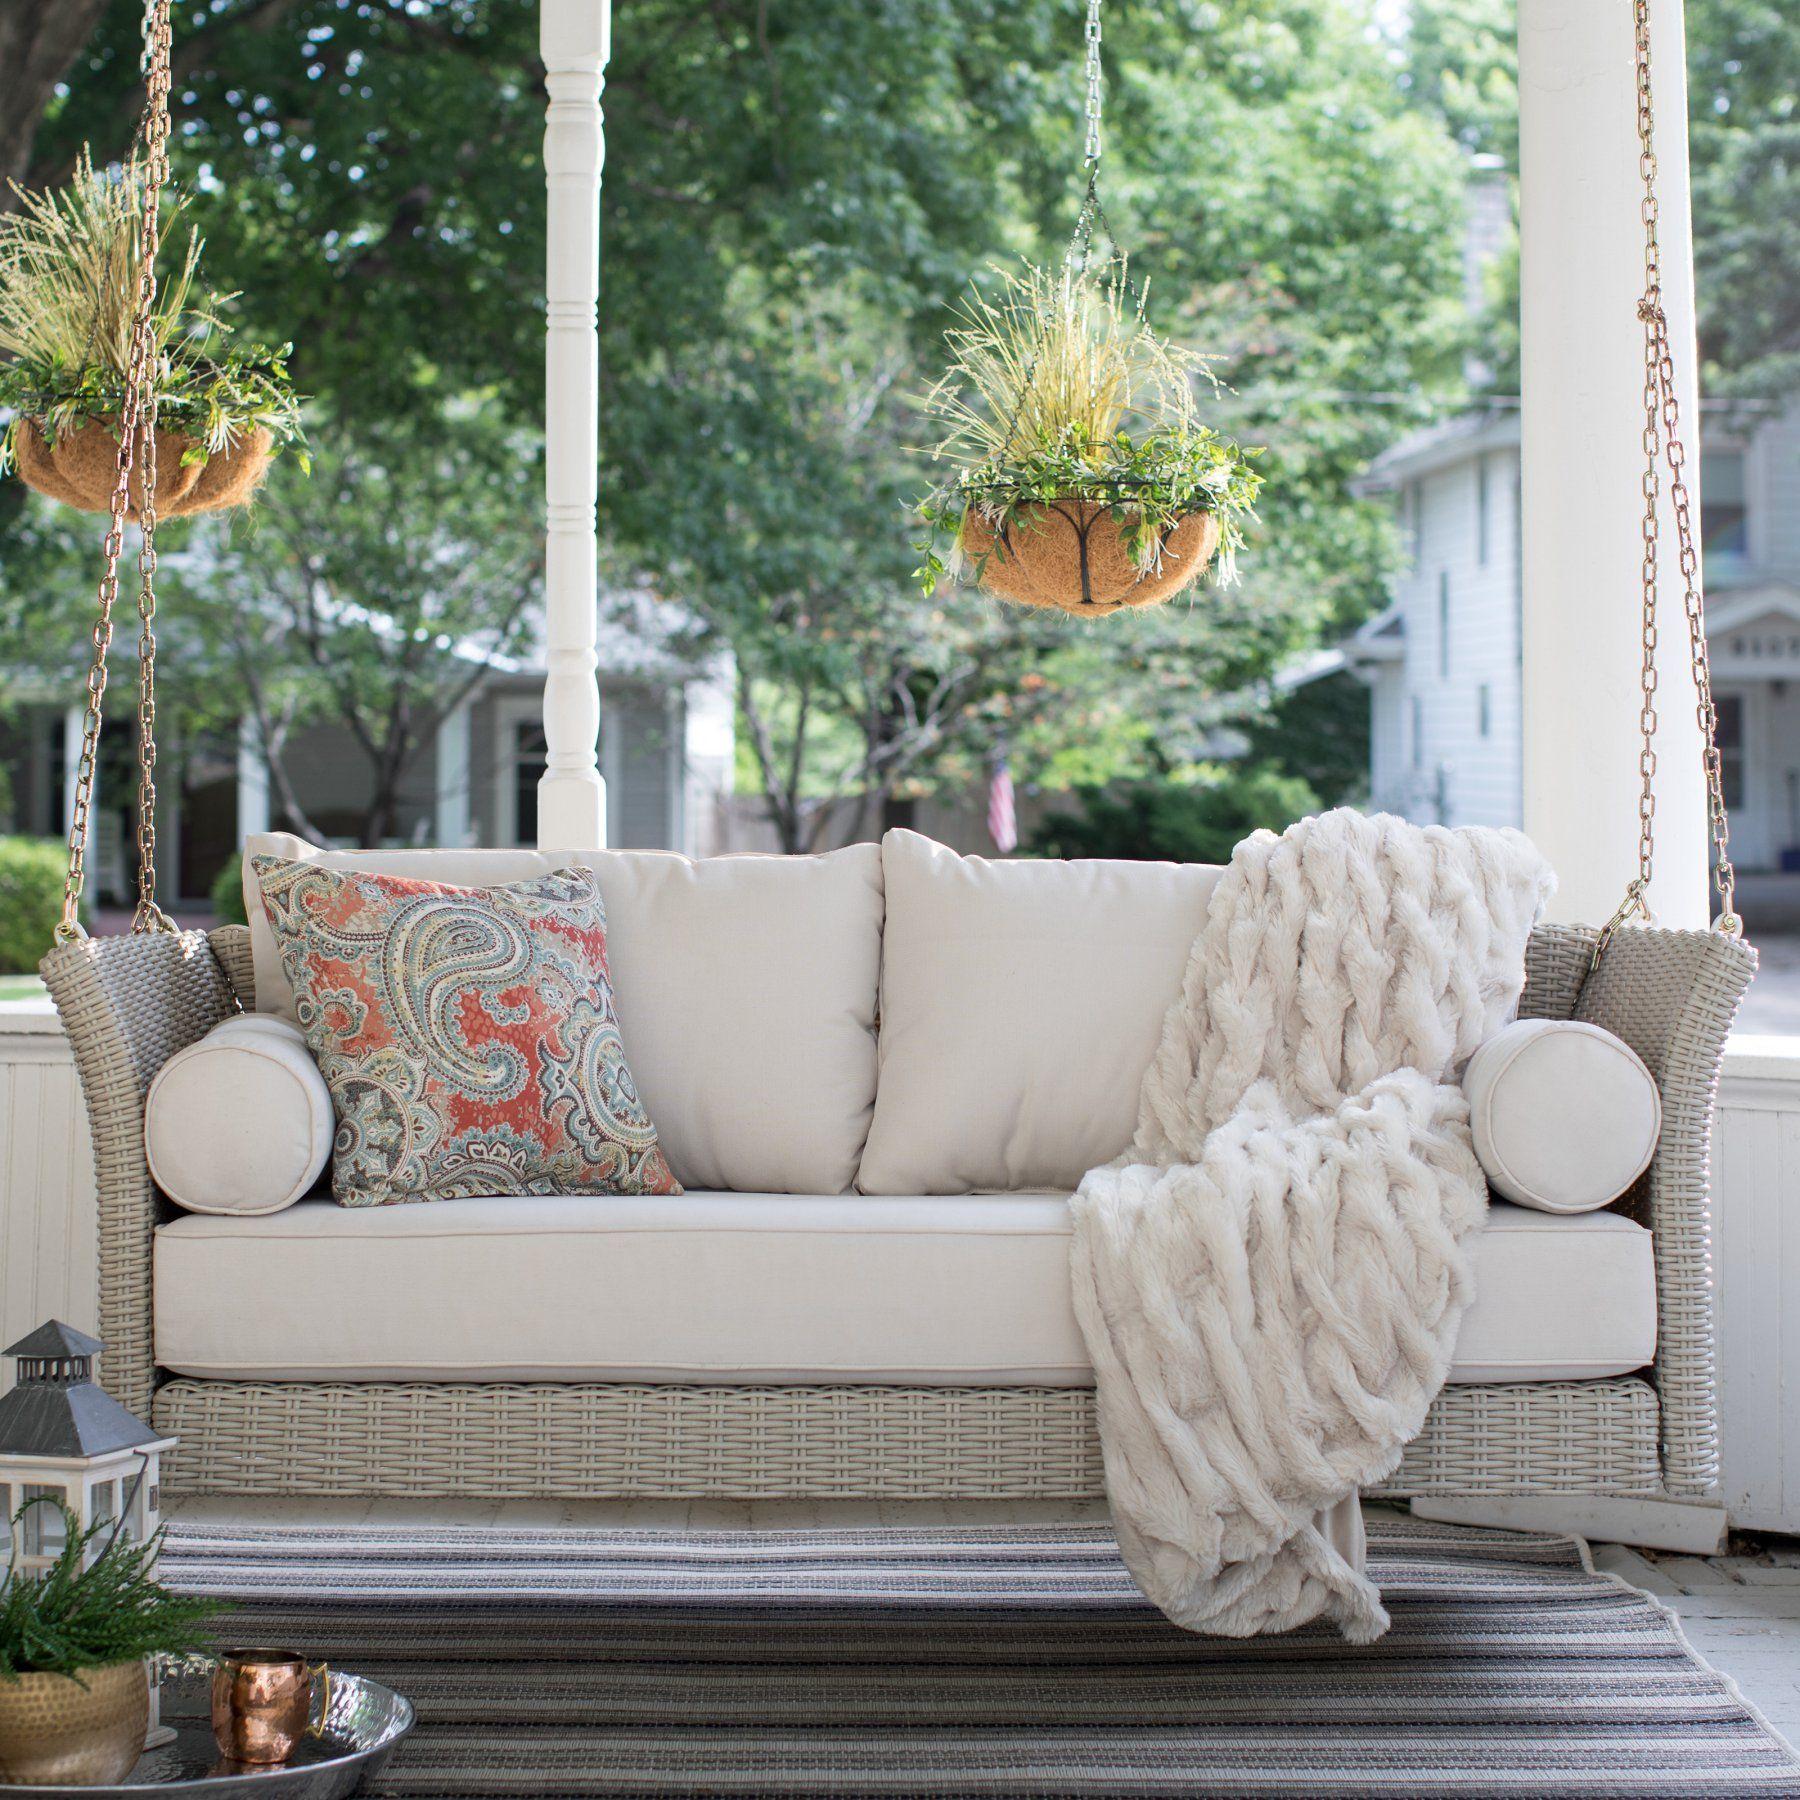 Belham living bellevue deep seating all weather wicker porch swing